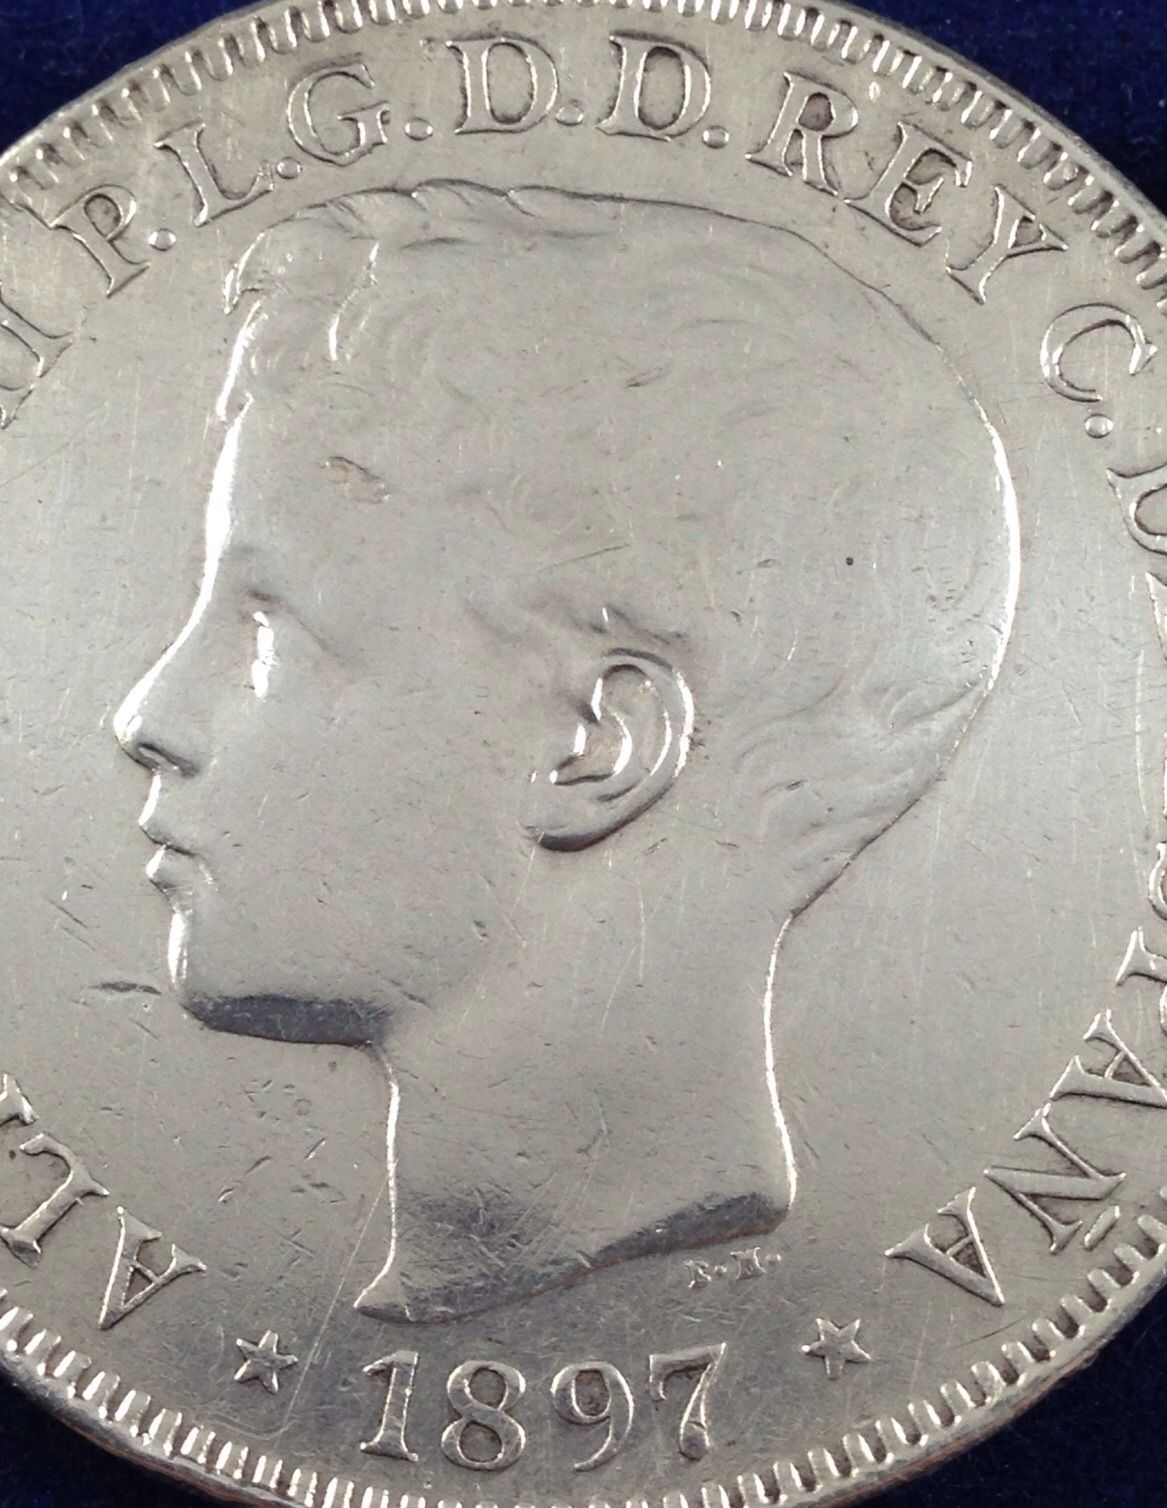 1 Peso 1897 SGC Alfonso XIII - Islas Filipinas Jjodc3